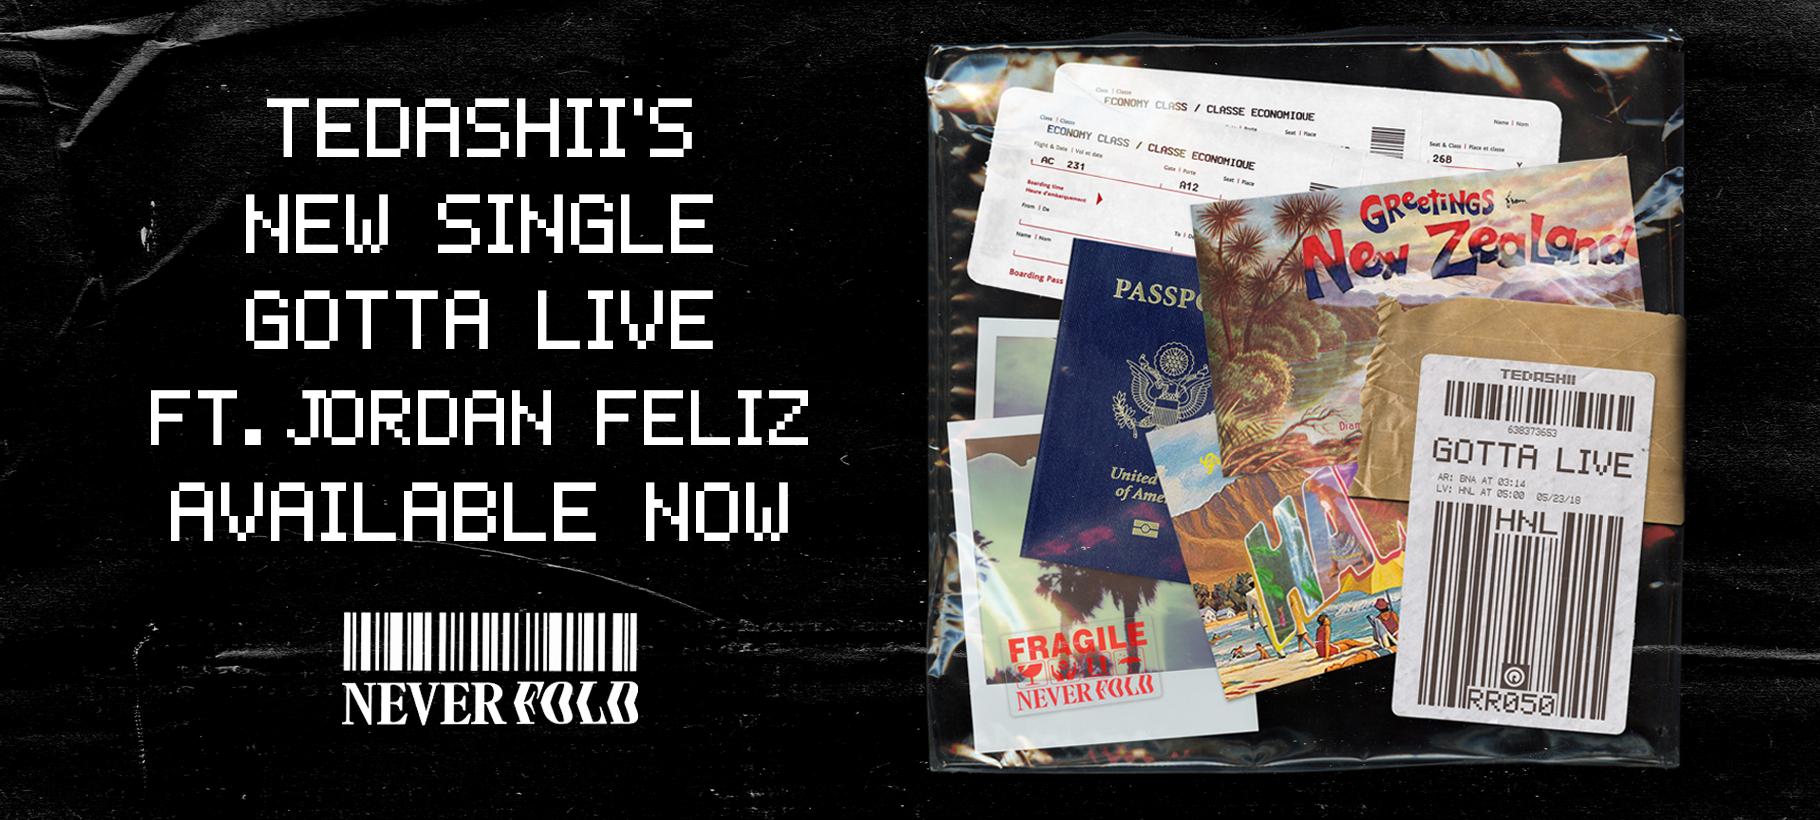 Tedashii x Gotta Live